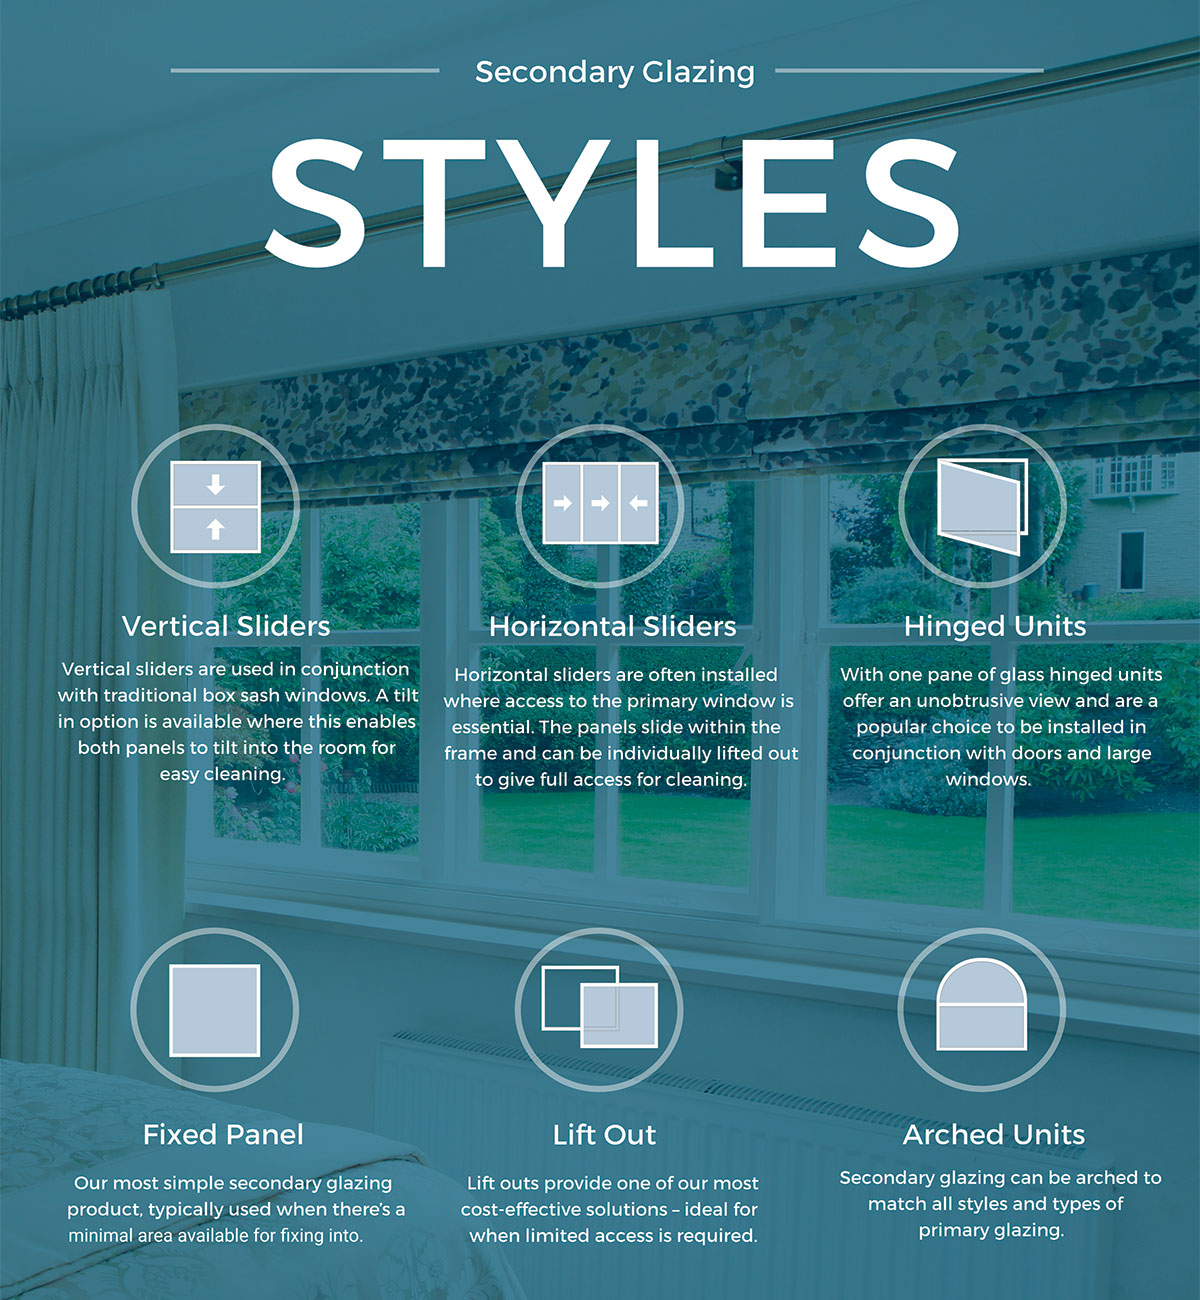 Secondary Glazing styles